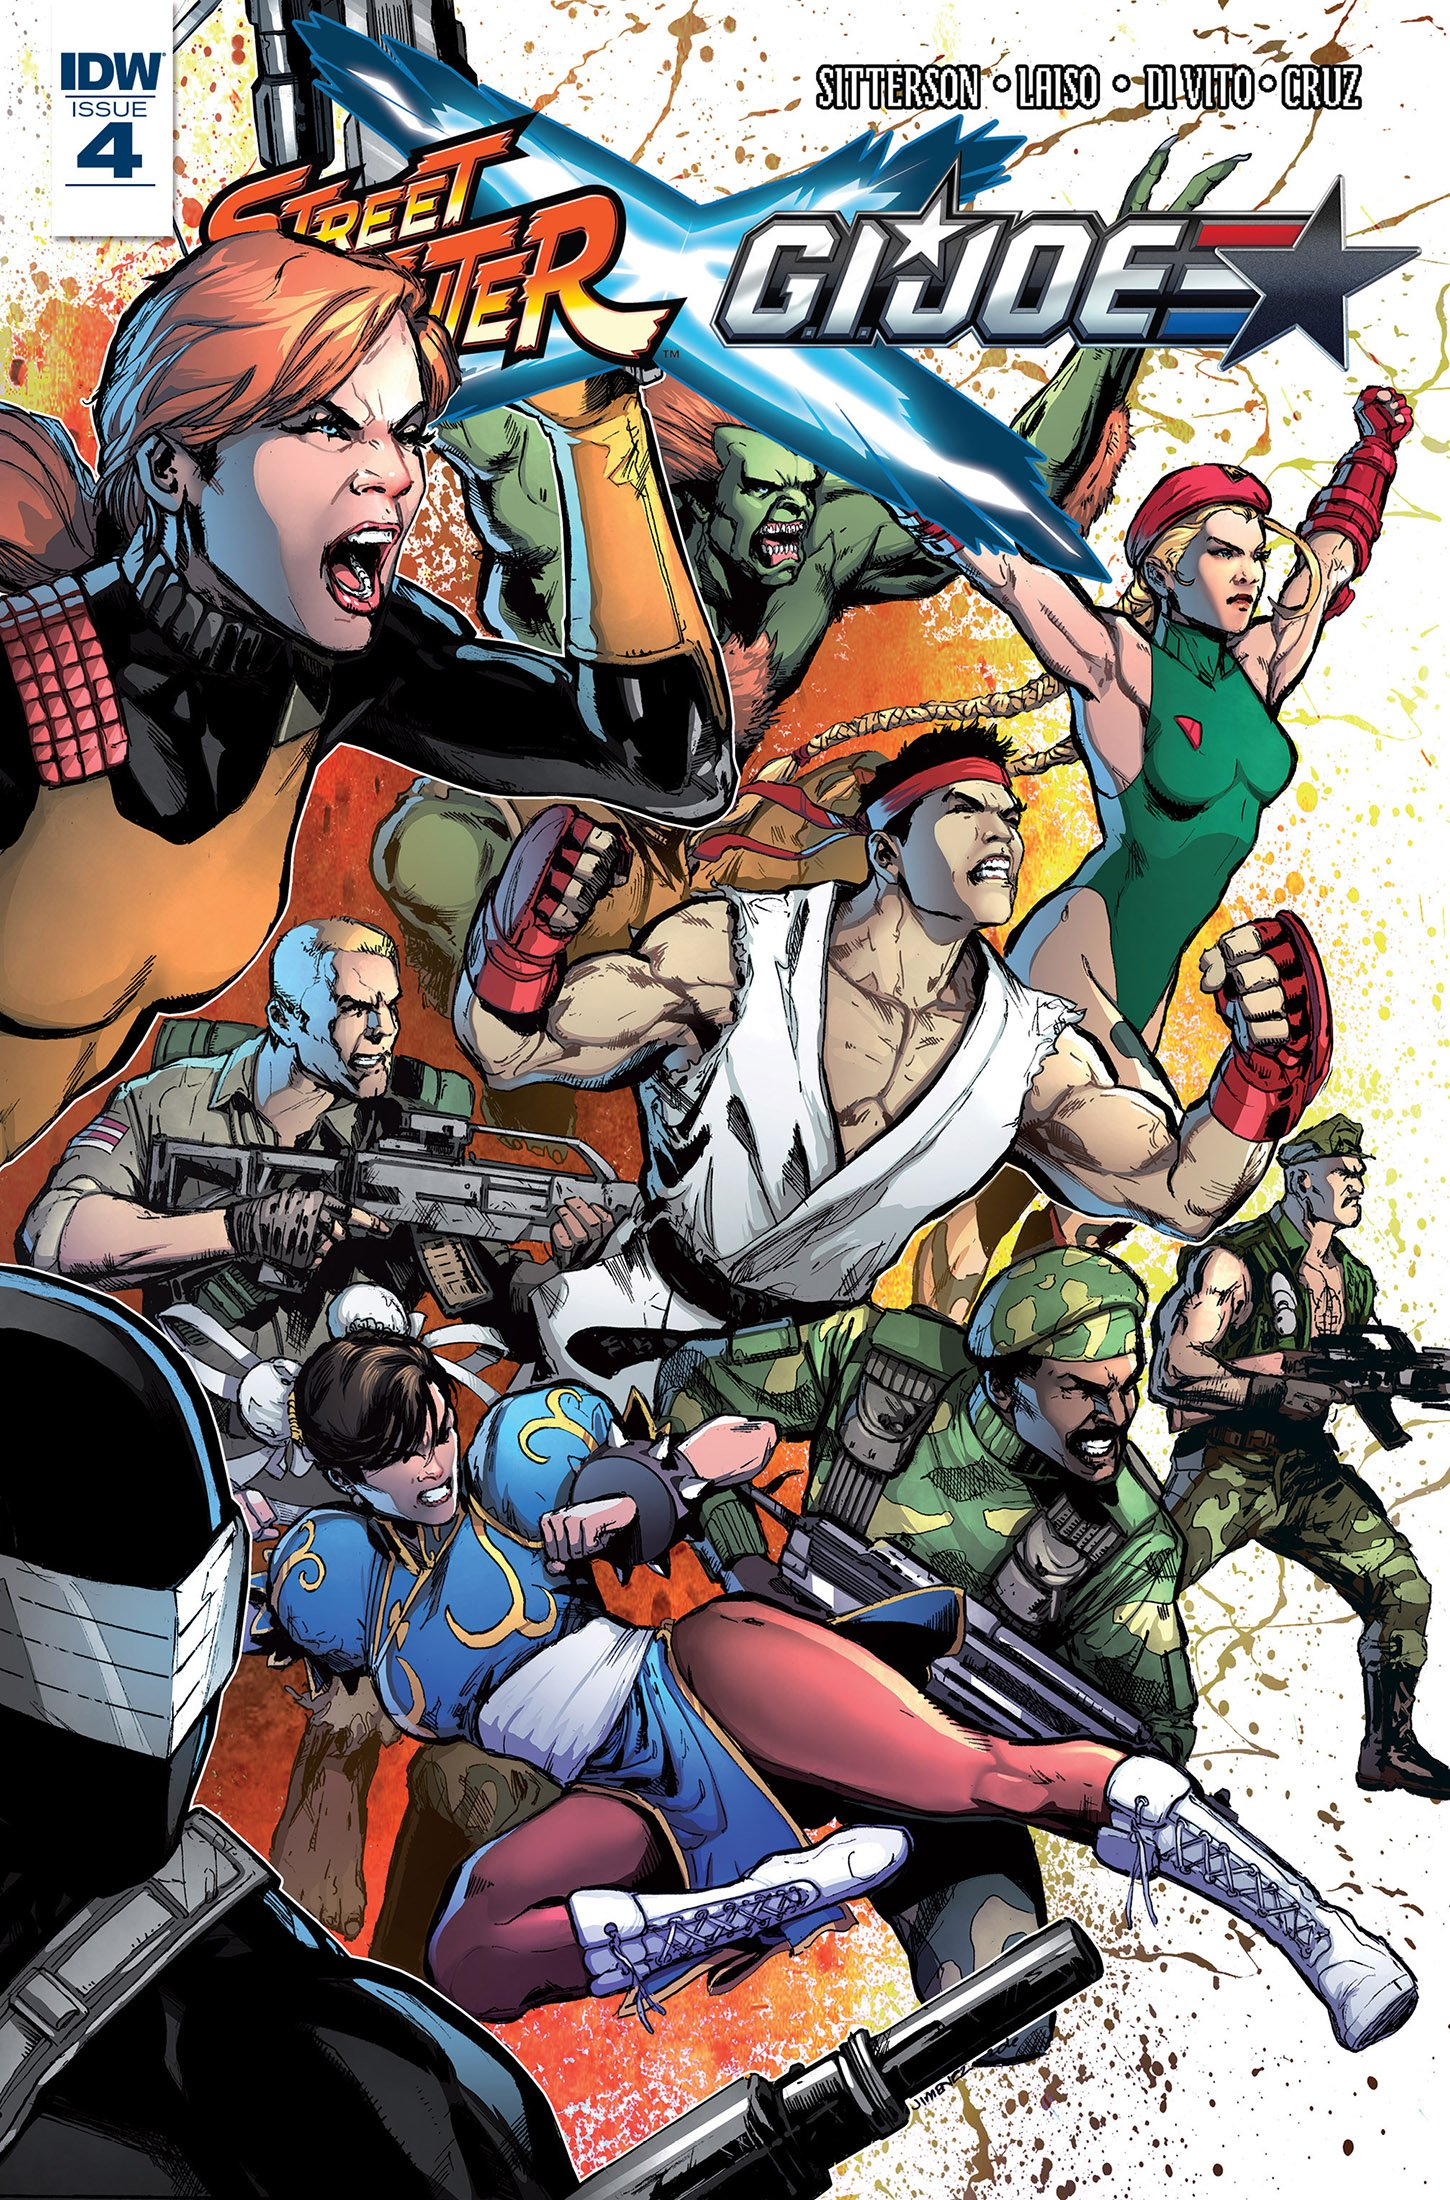 Street Fighter X G.I. JOE 004 (May 2016)